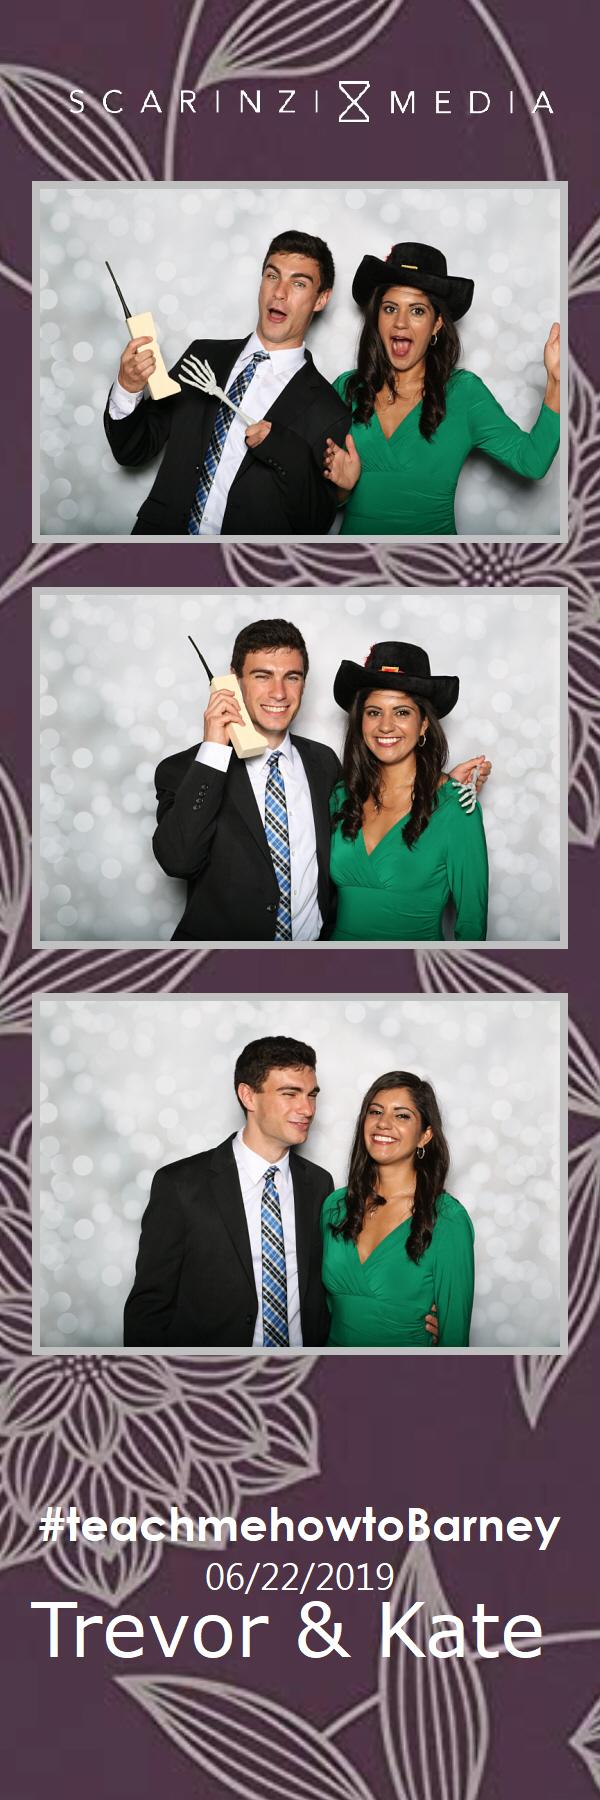 2019.06.22 - Barney Wedding PHOTOBOOTH08.jpg